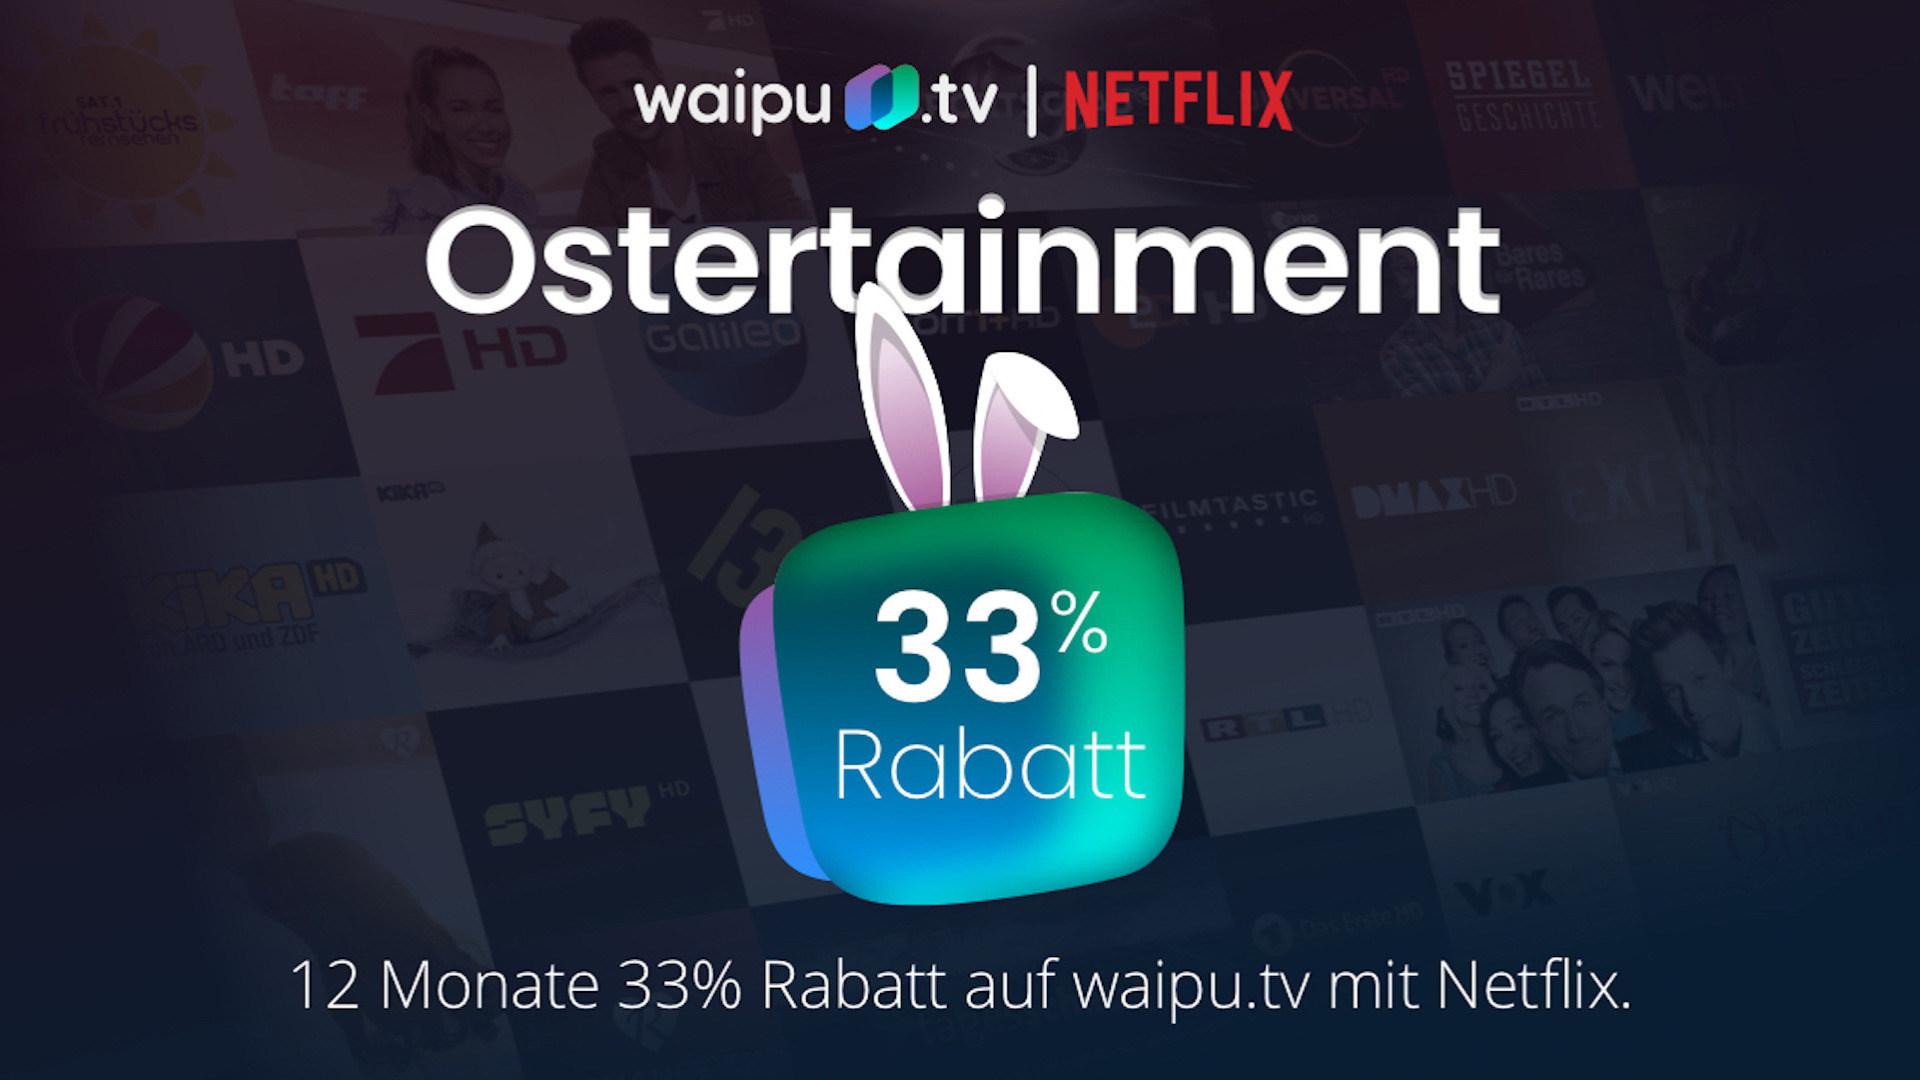 Streaming, Tv, Aktion, Waipu.tv, waipu